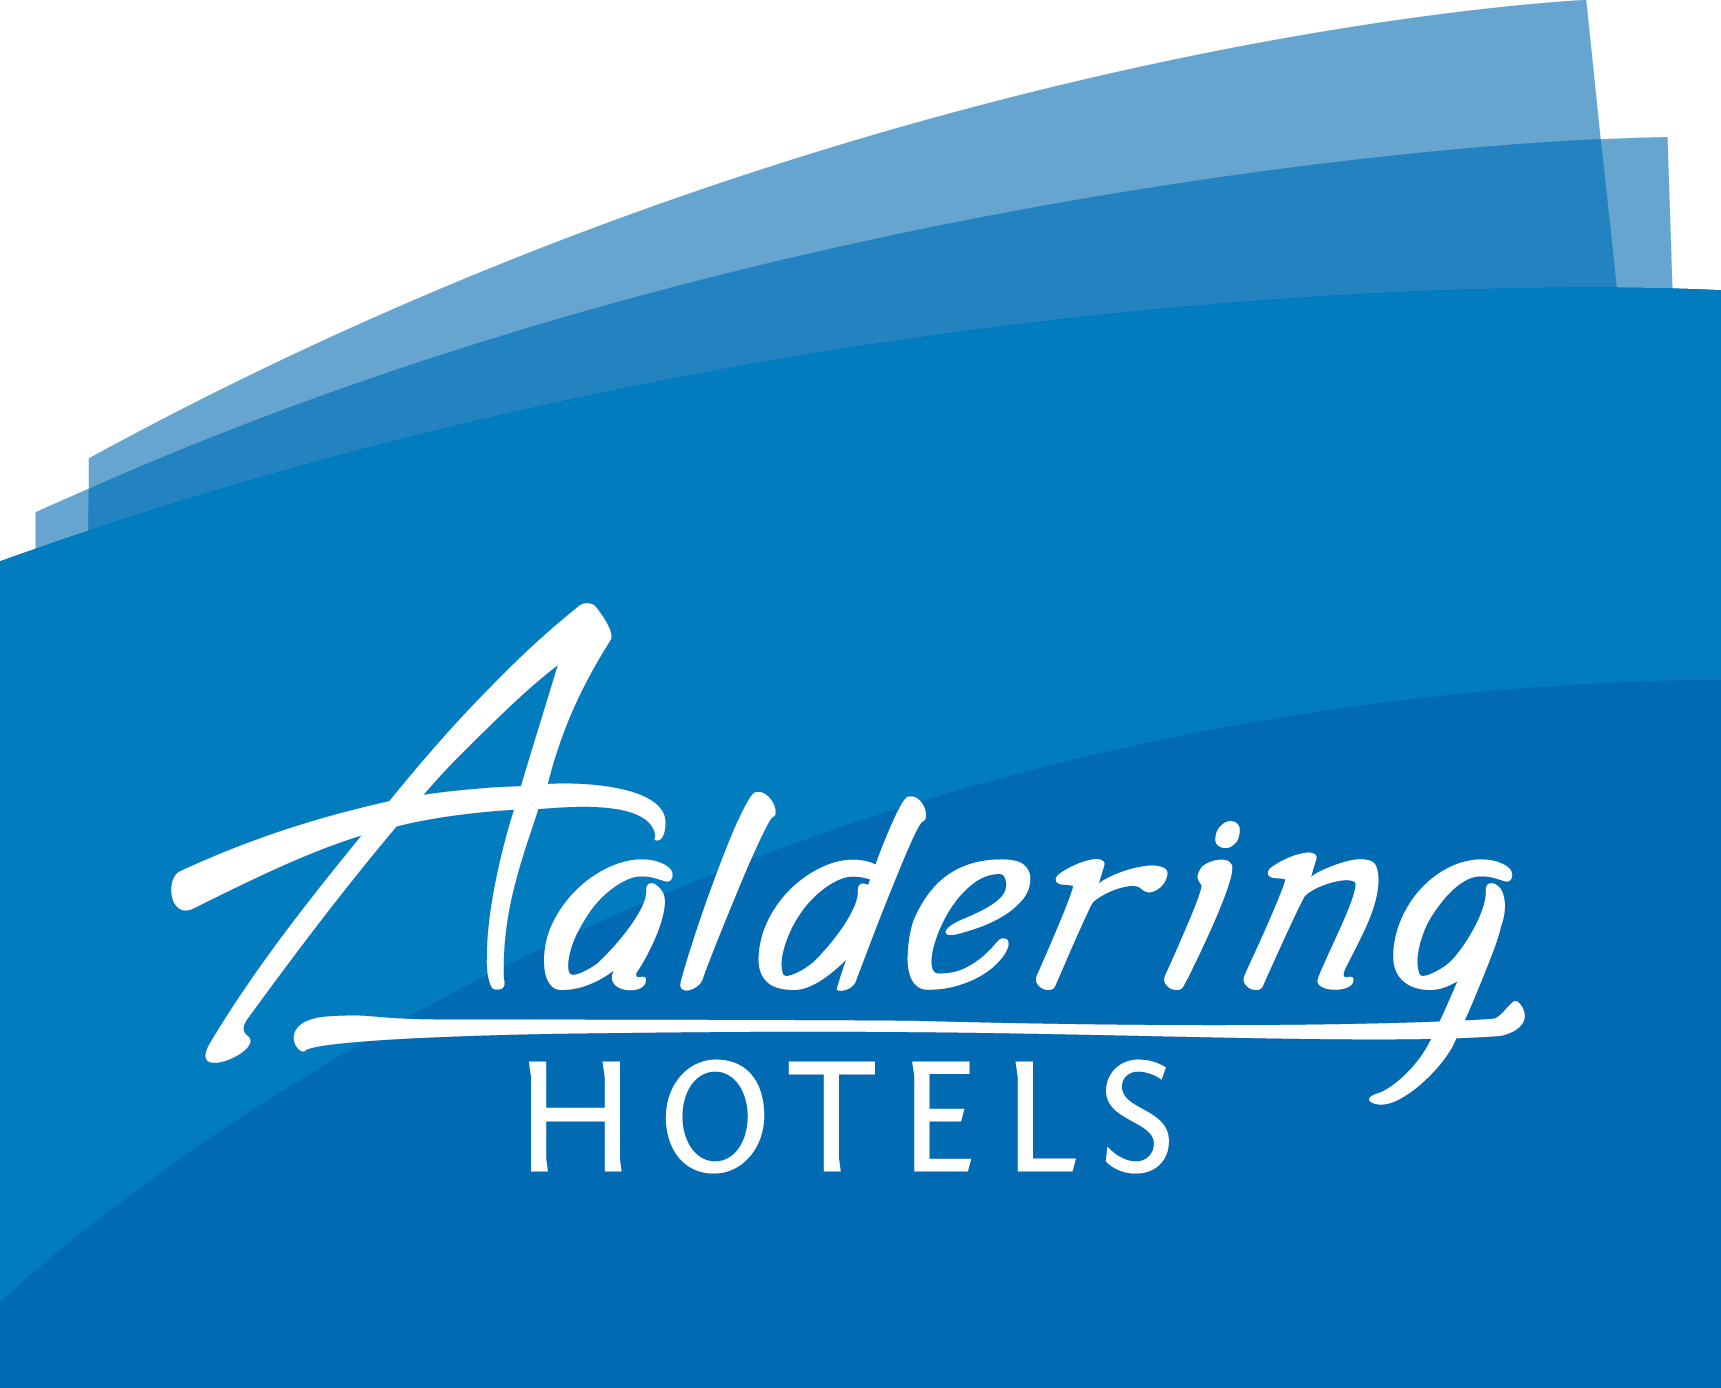 Aaldering Hotels